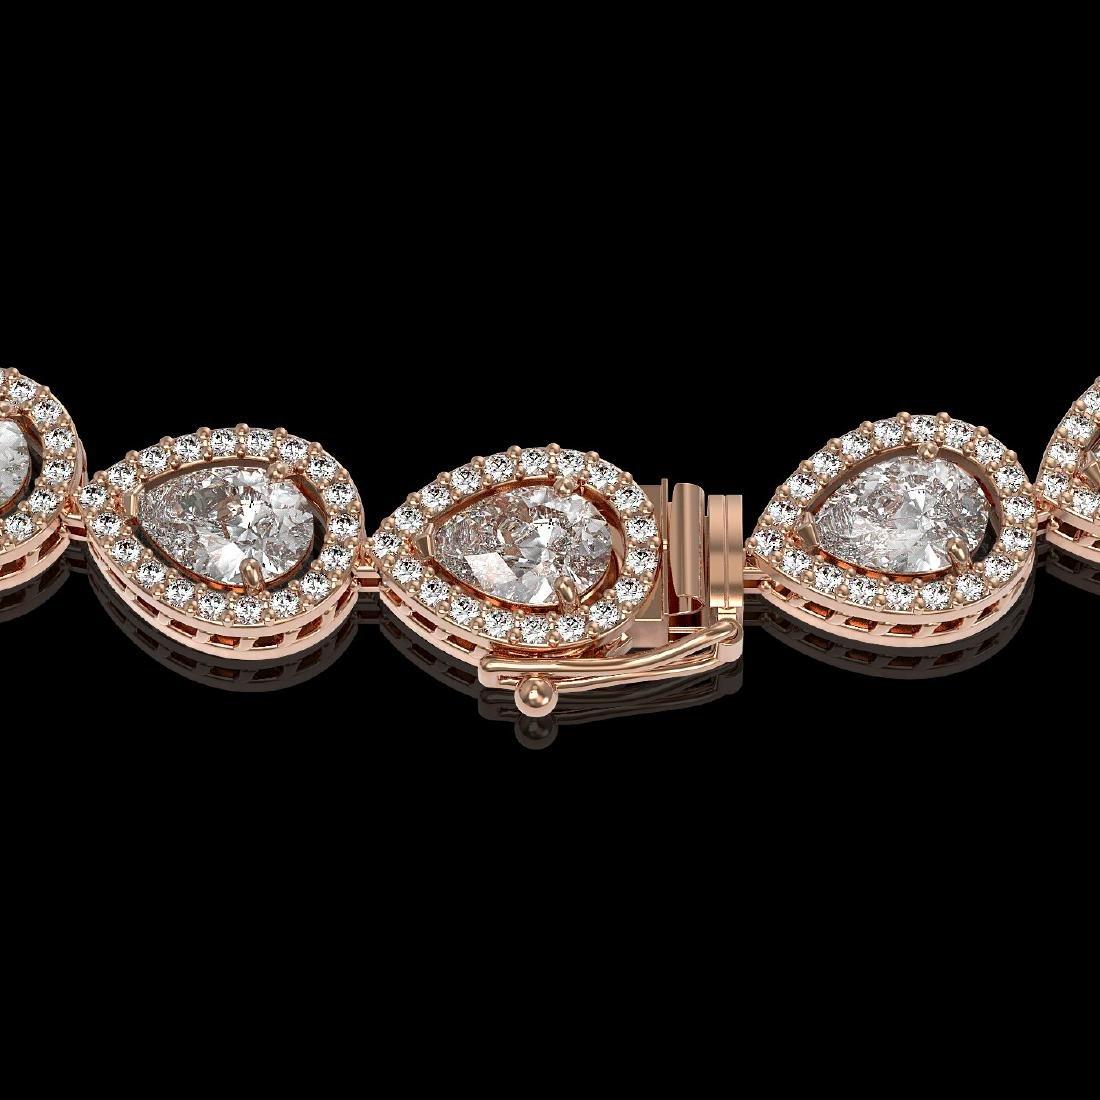 28.74 CTW Pear Diamond Designer Necklace 18K Rose Gold - 3